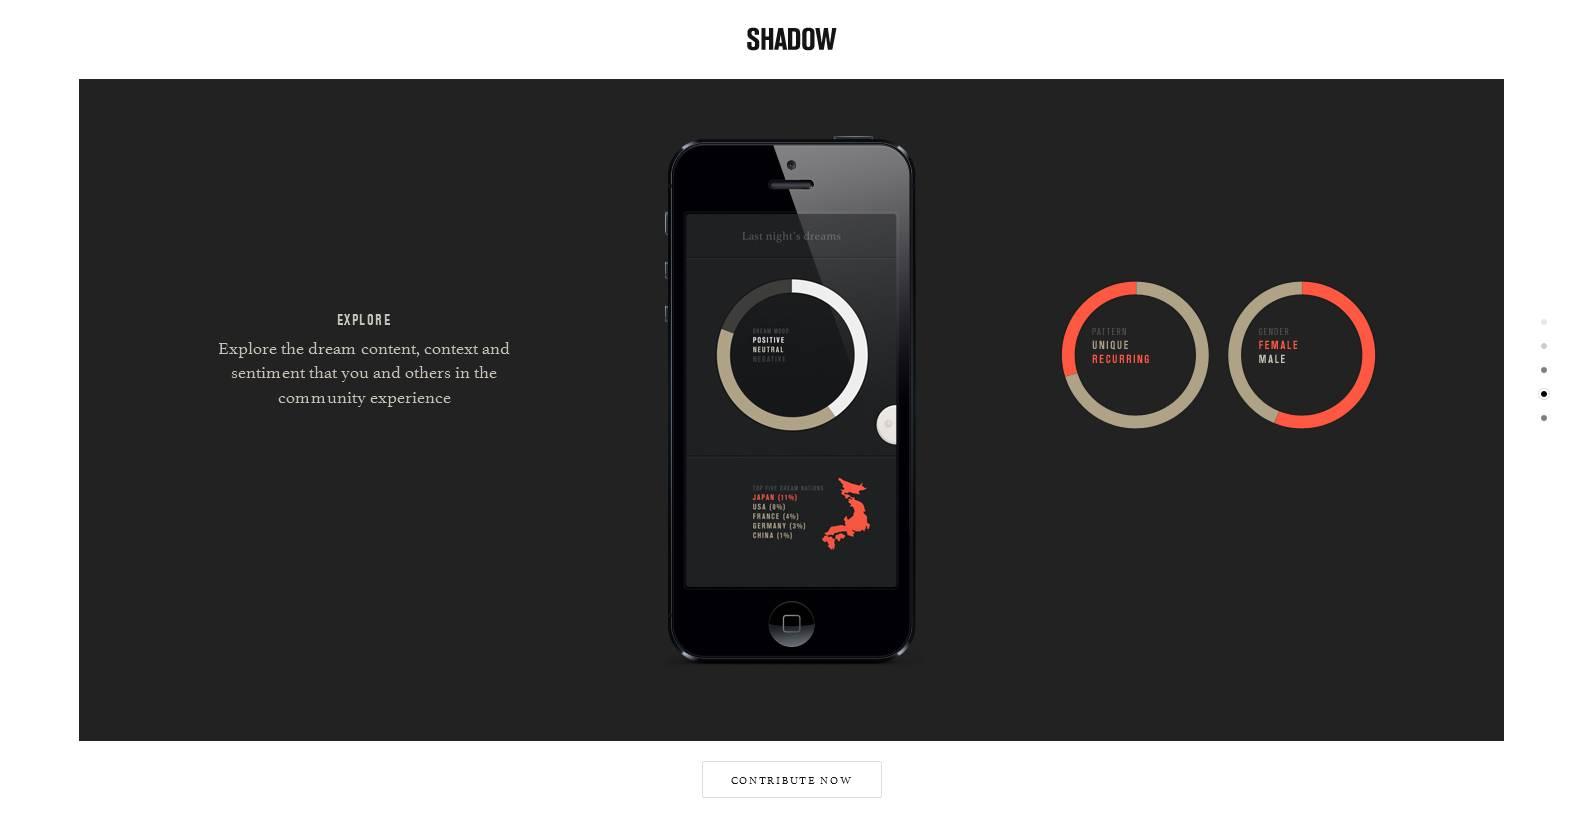 #1208 - 'SHADOW I Community of Dreamers' - discovershadow_com